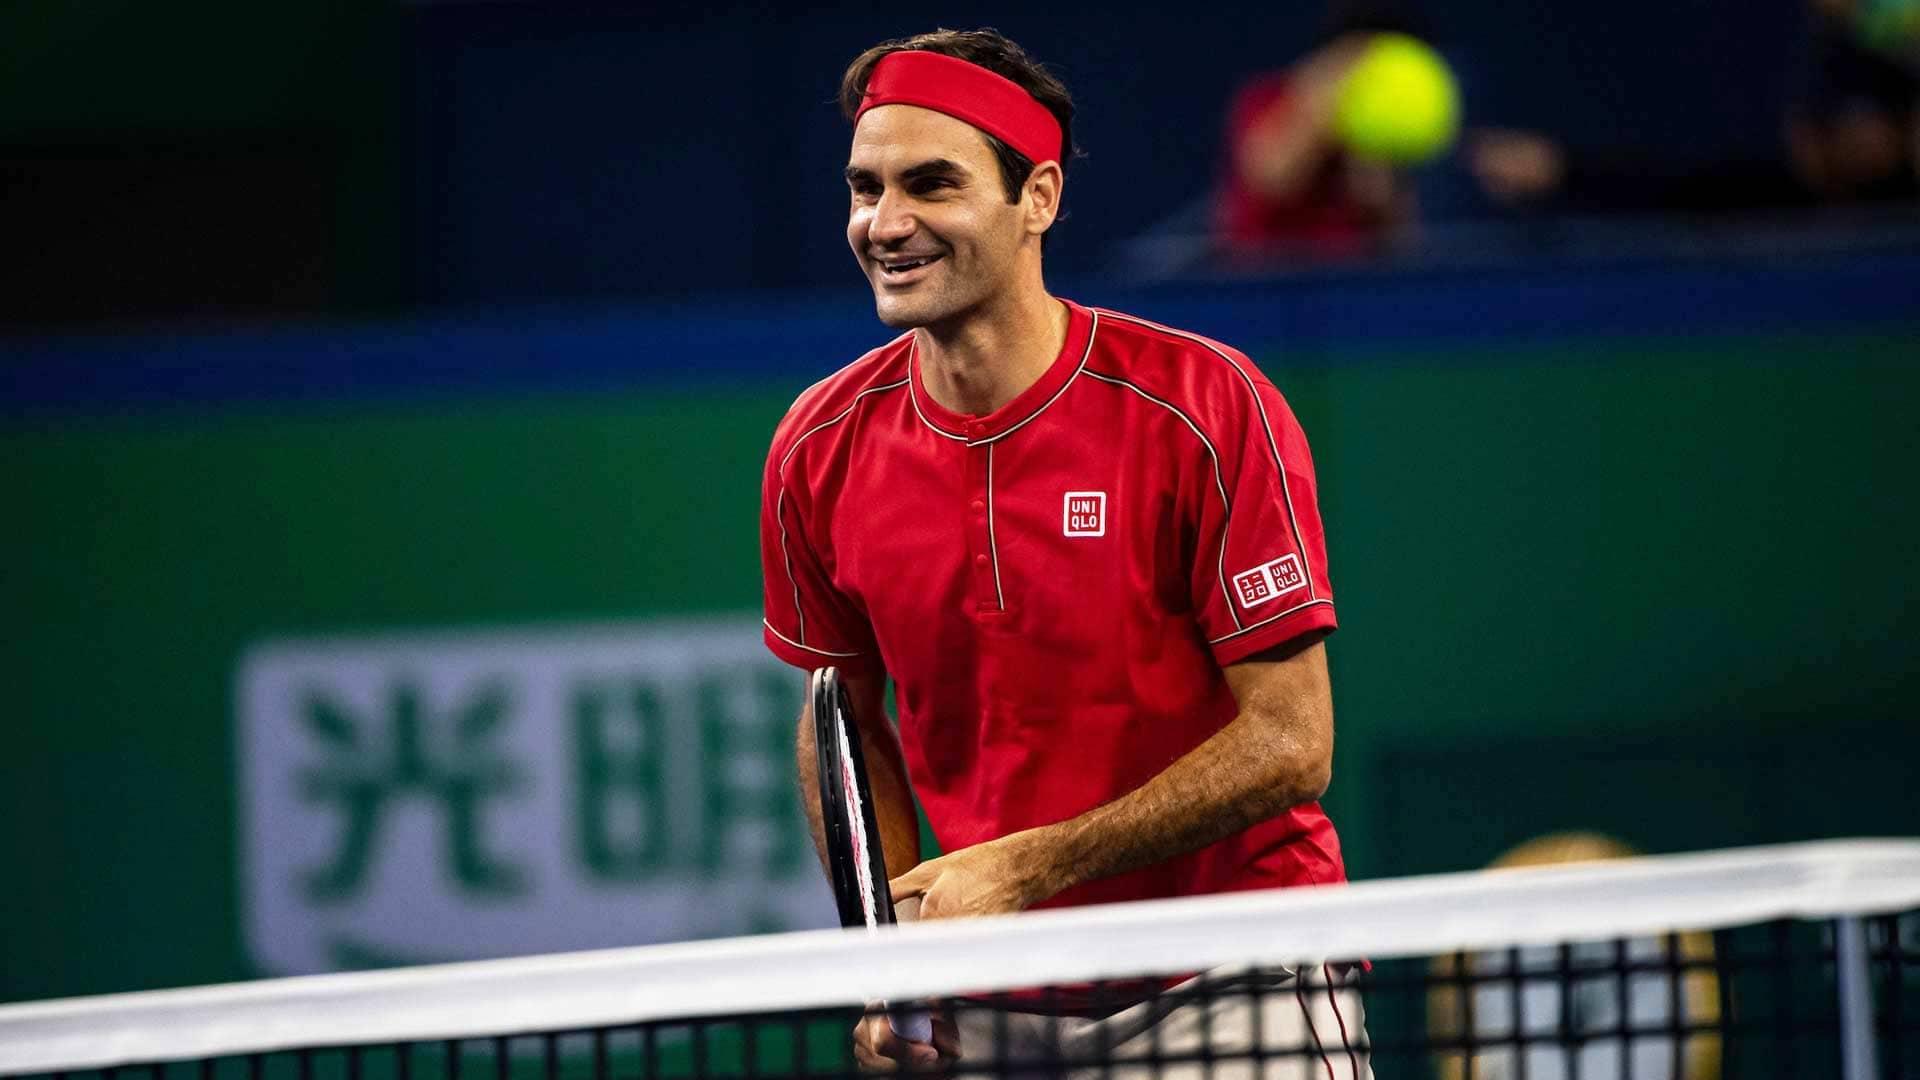 Roger Federer reacts in Shanghai 2019